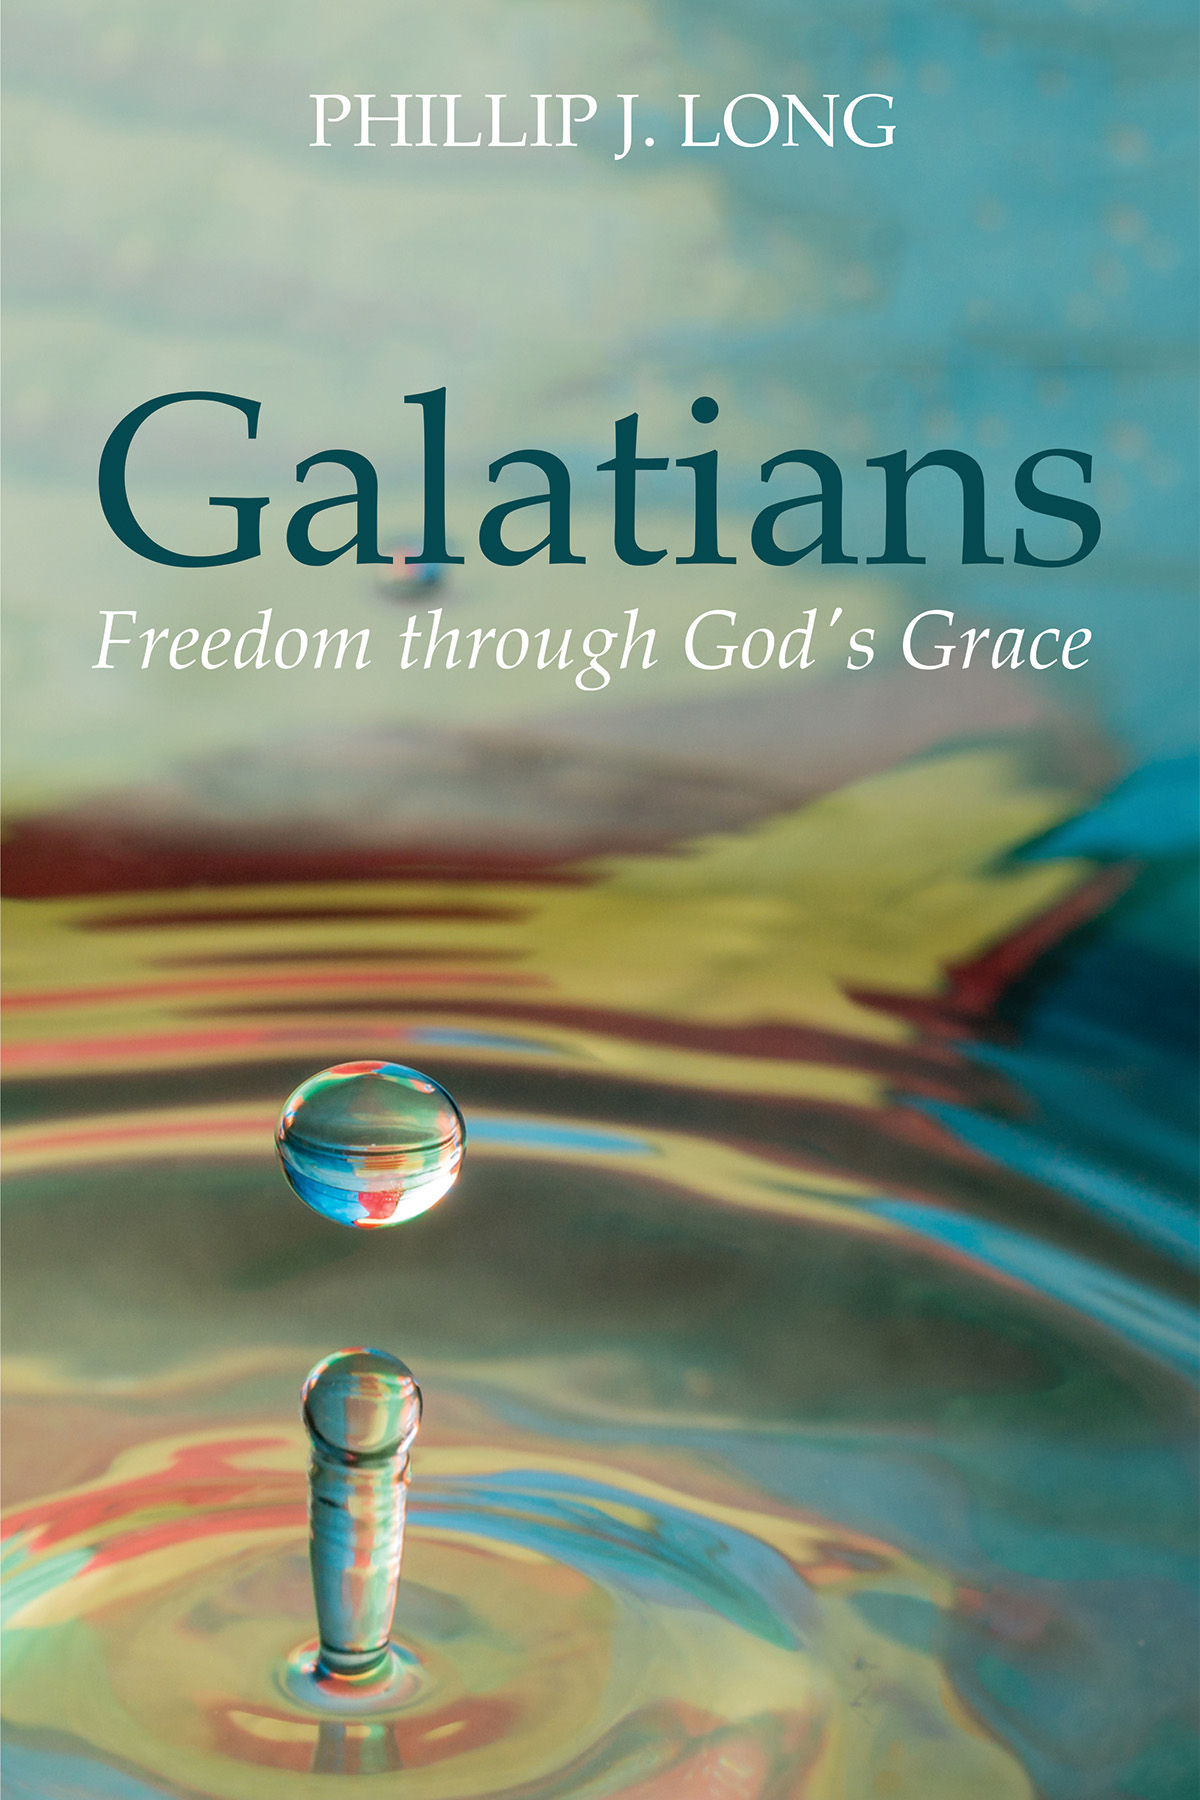 My New Book: Galatians: Freedom through God's Grace